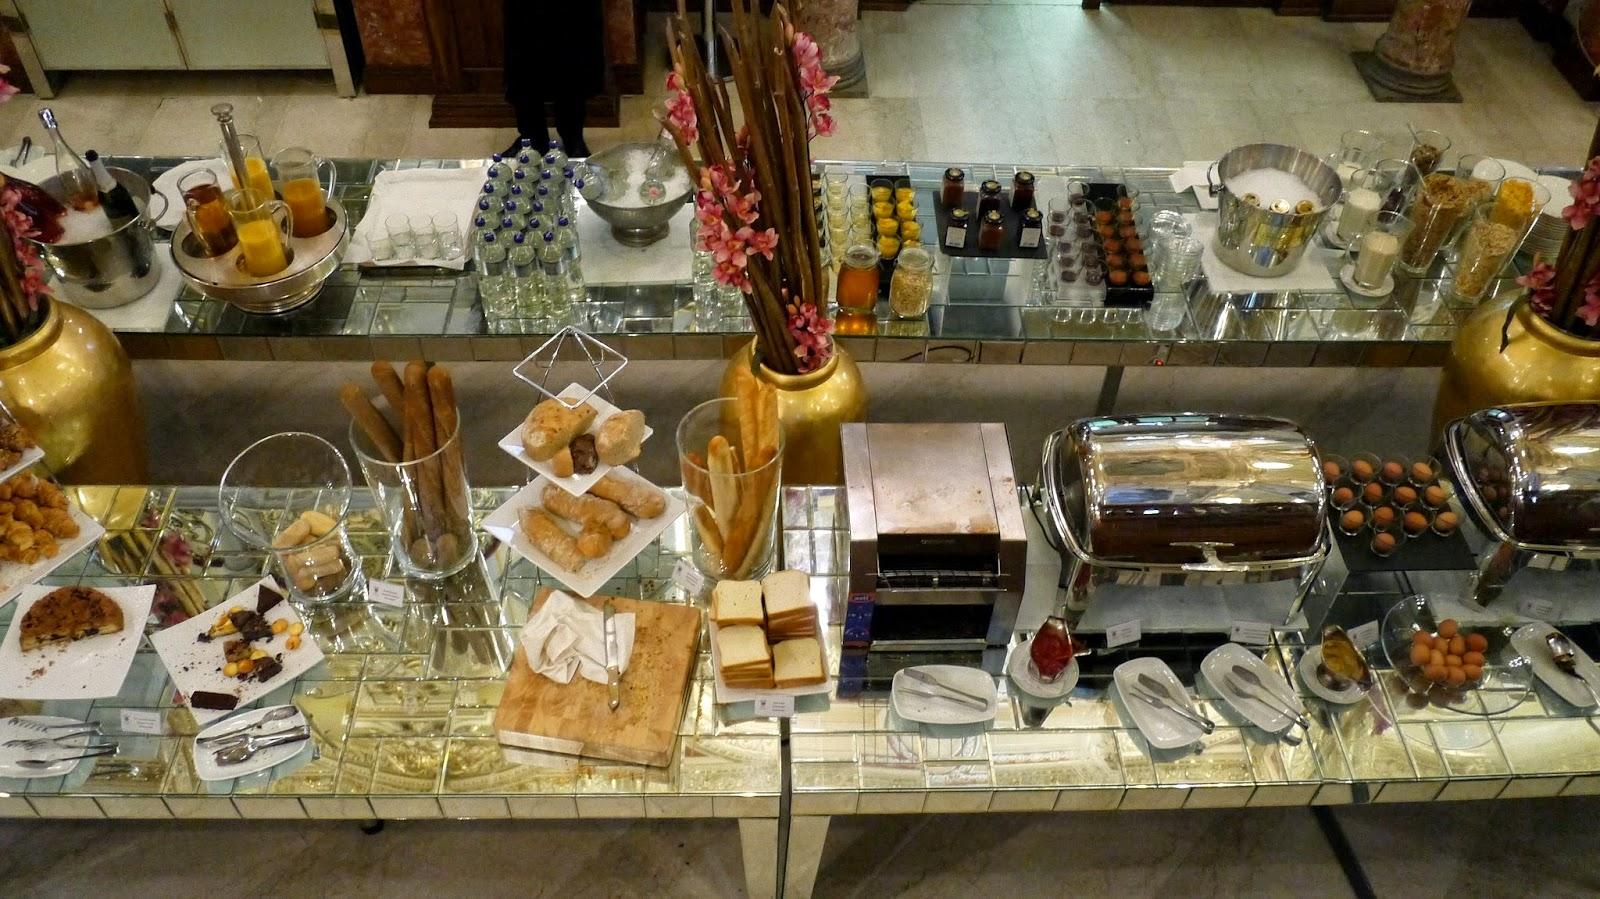 New York Cafe Budapest breakfast buffet